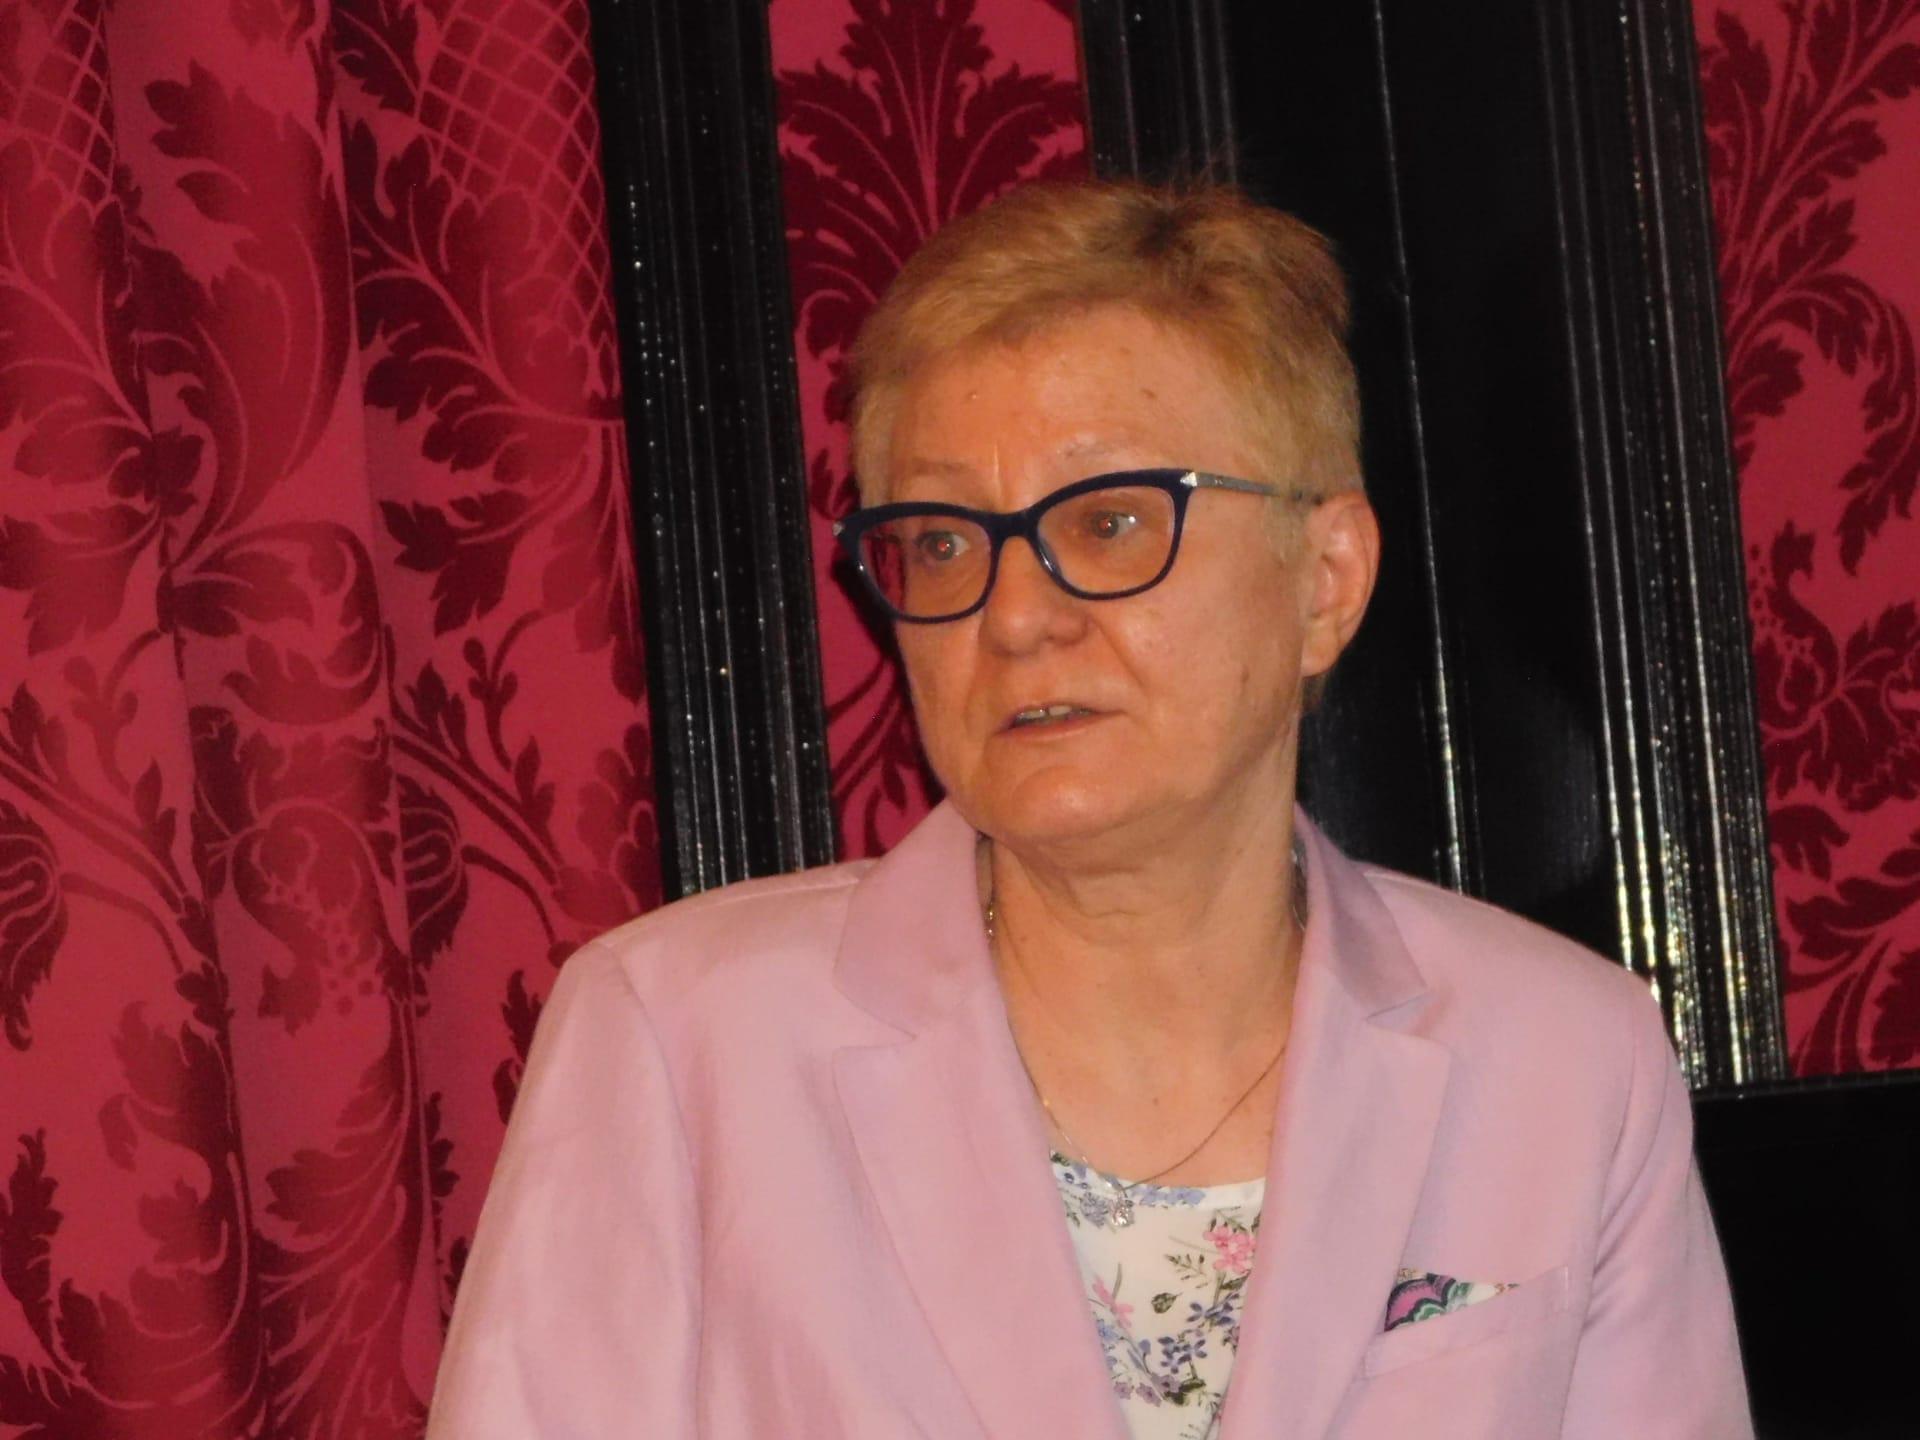 Sanja Vulić (Photo: Glas Hrvatske)